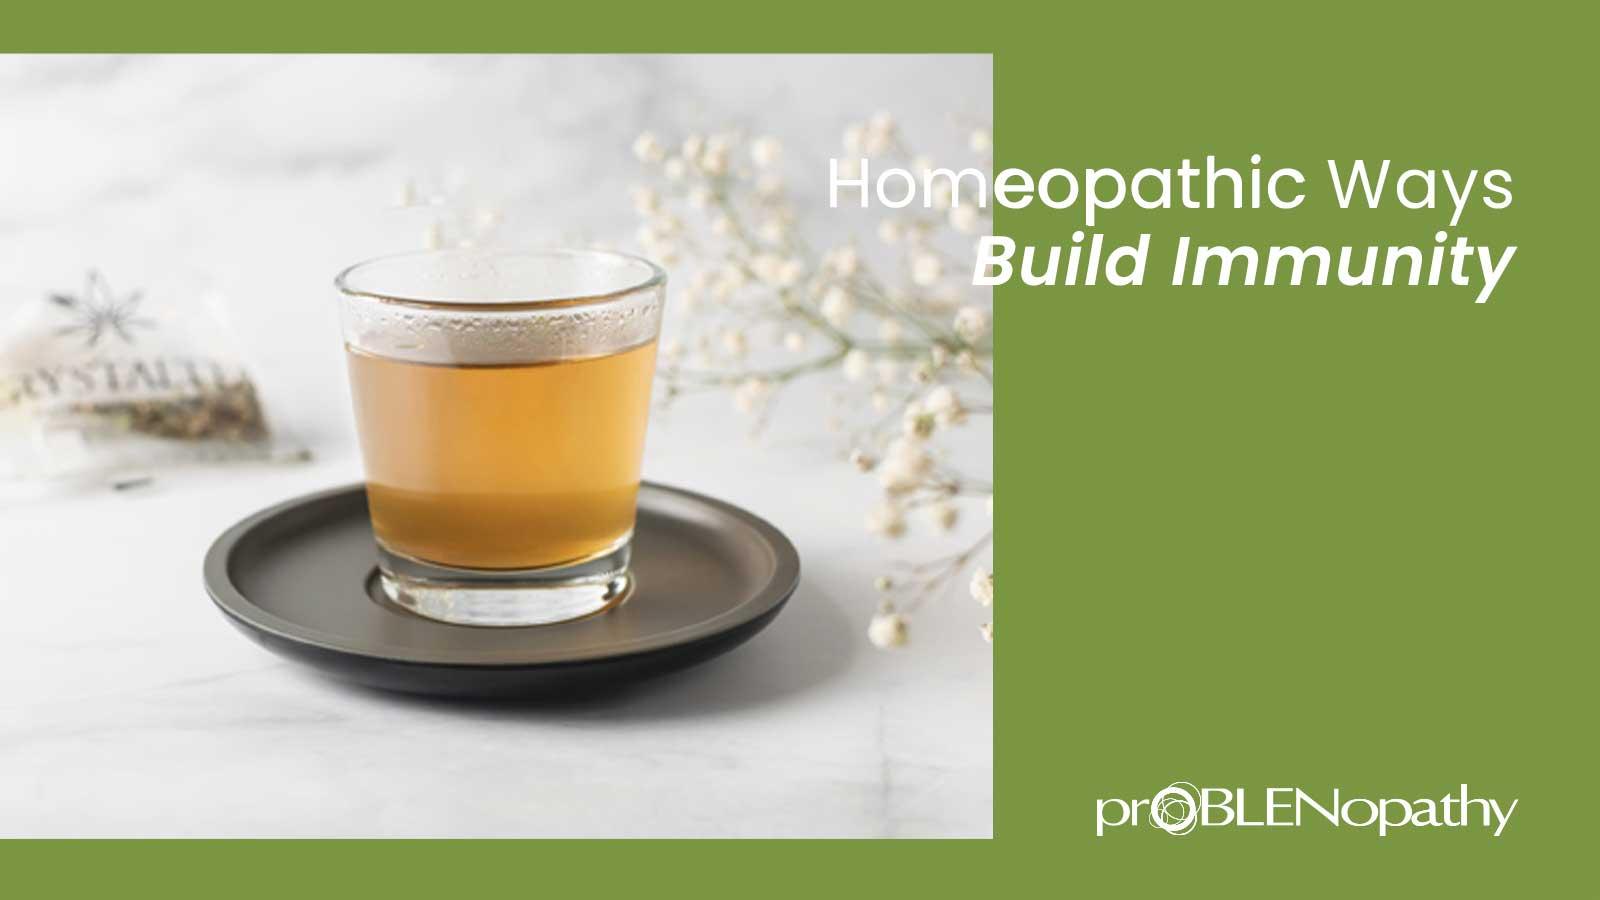 9 homeopathic ways to improve immunity